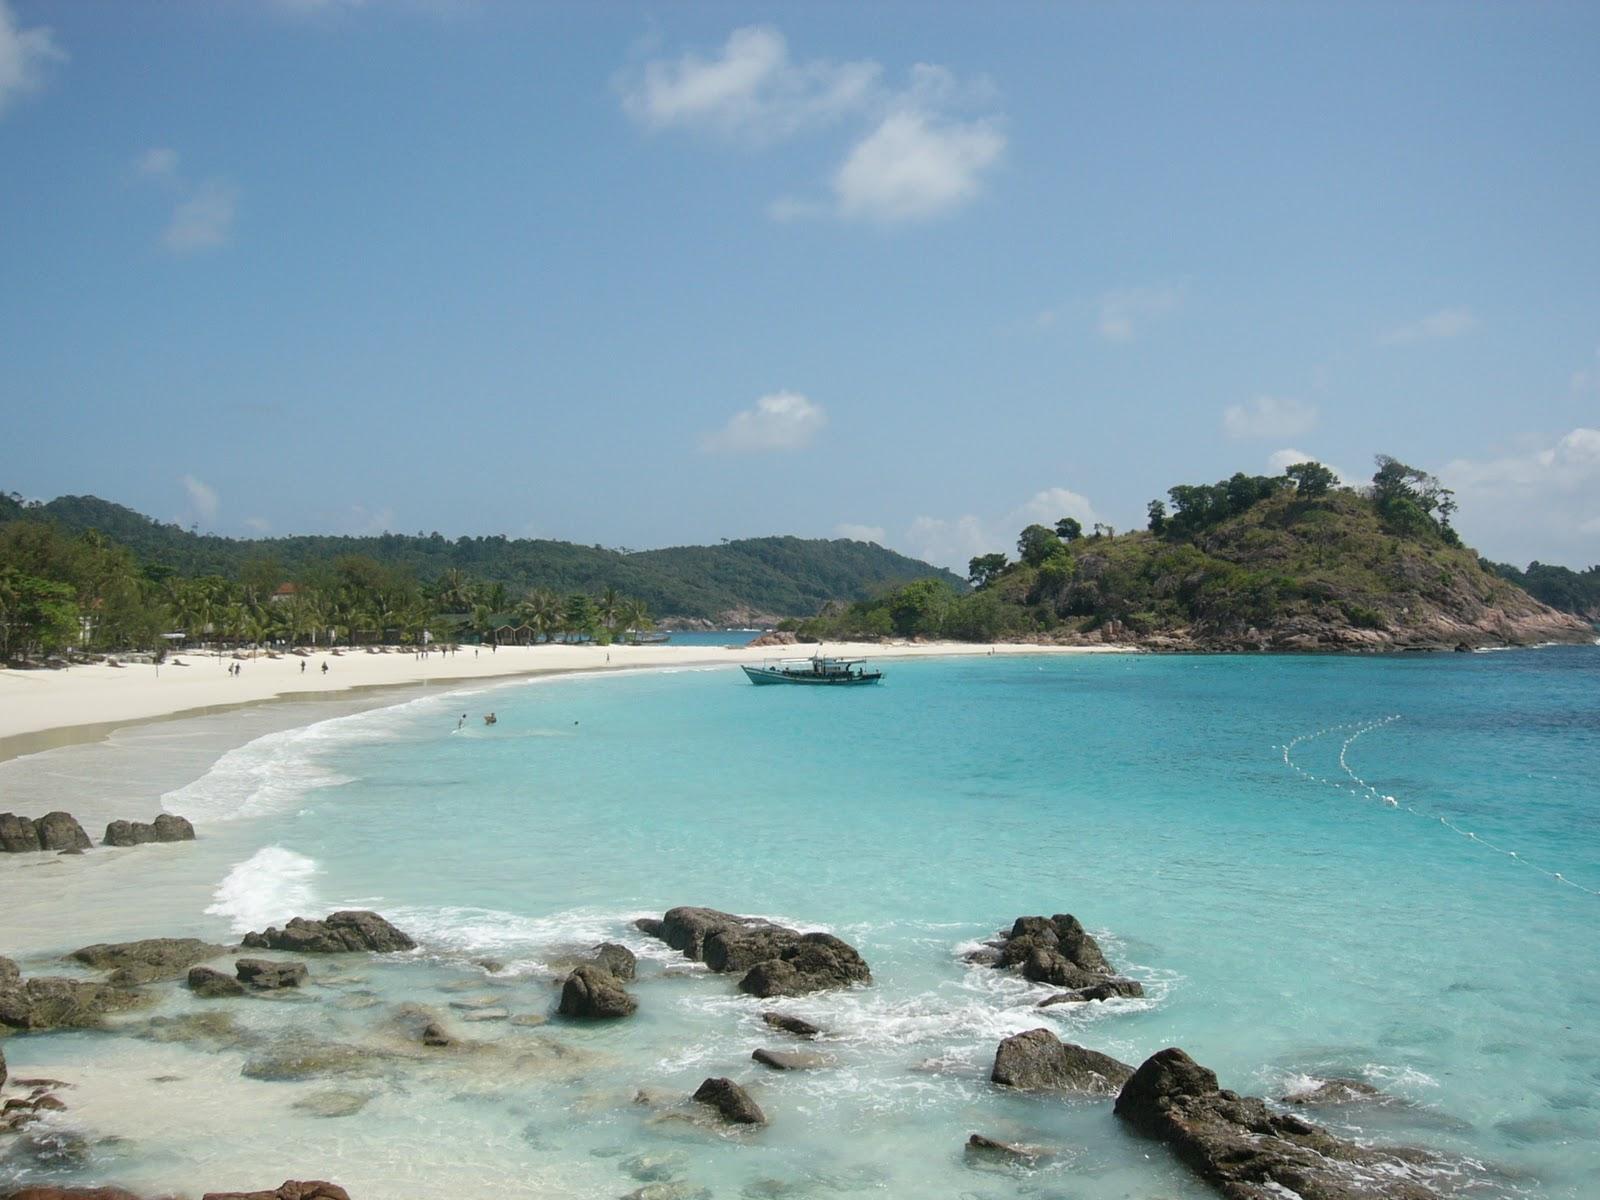 Pantai Pasir Panjang Singkawang Bumi Nusantara Terletak Kecamatan Tujuh Belas